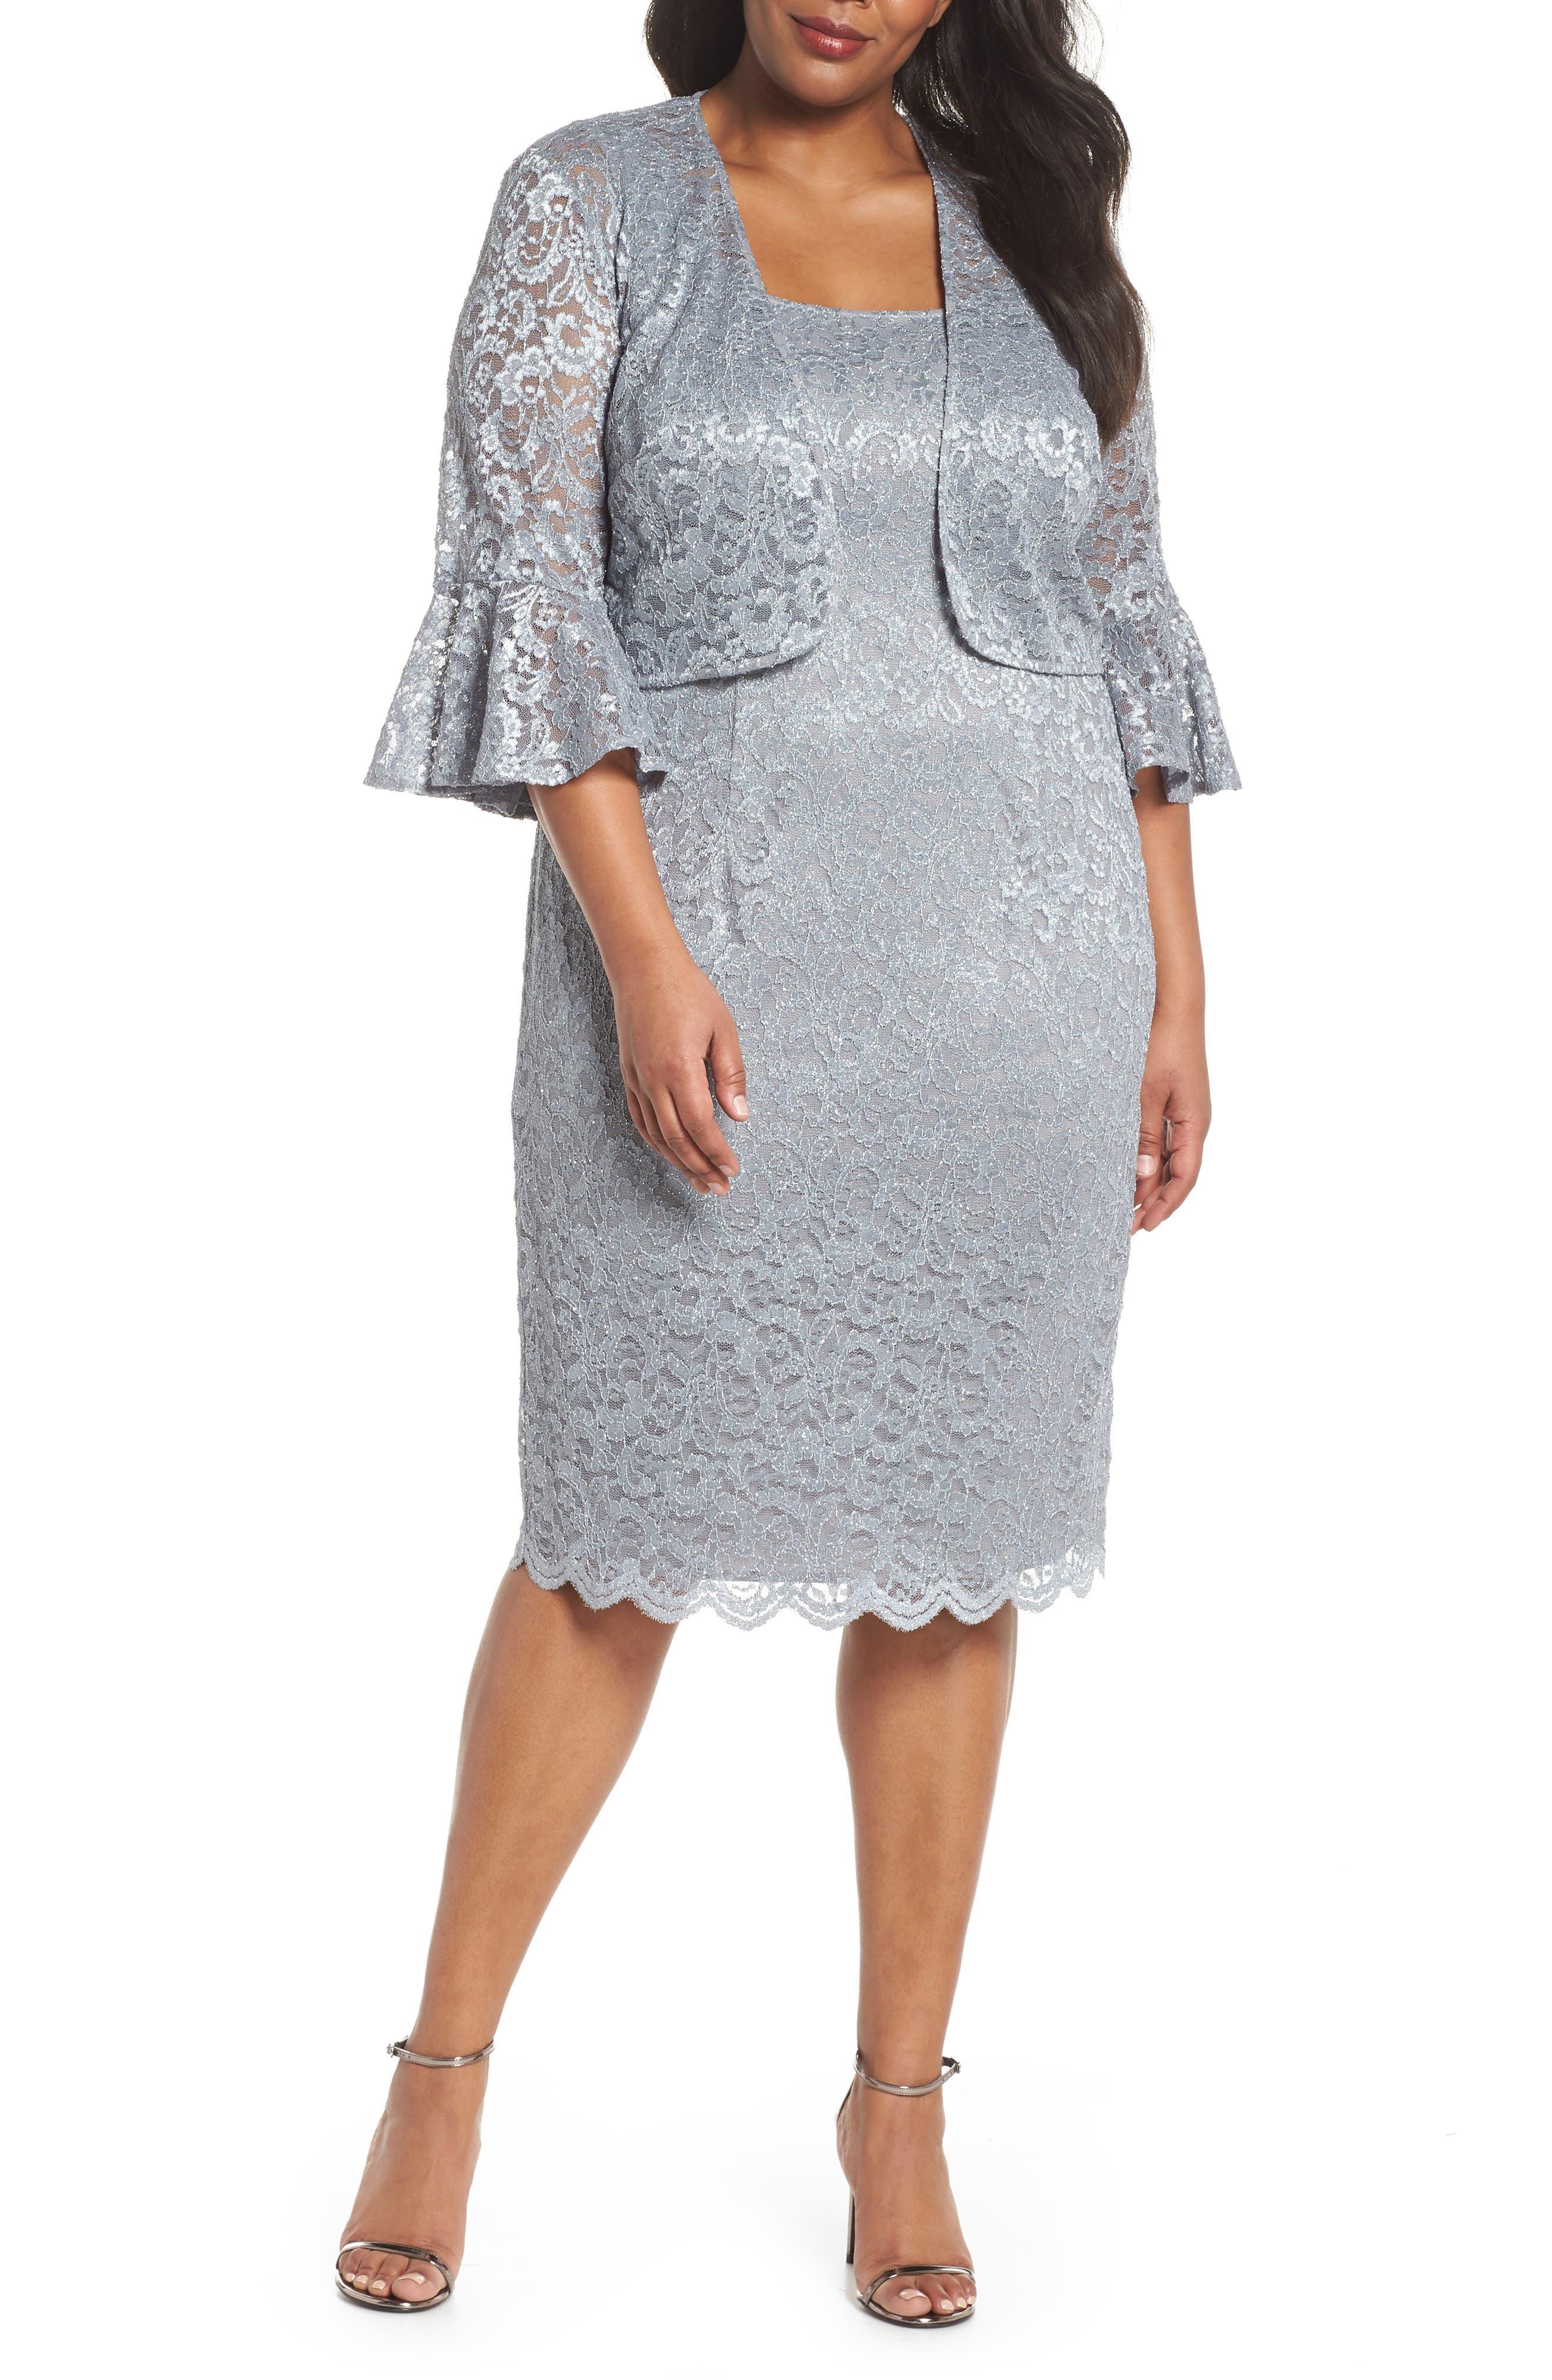 ALEX EVENINGS Lace Sheath Dress with Bolero Jacket, Main, color, 040